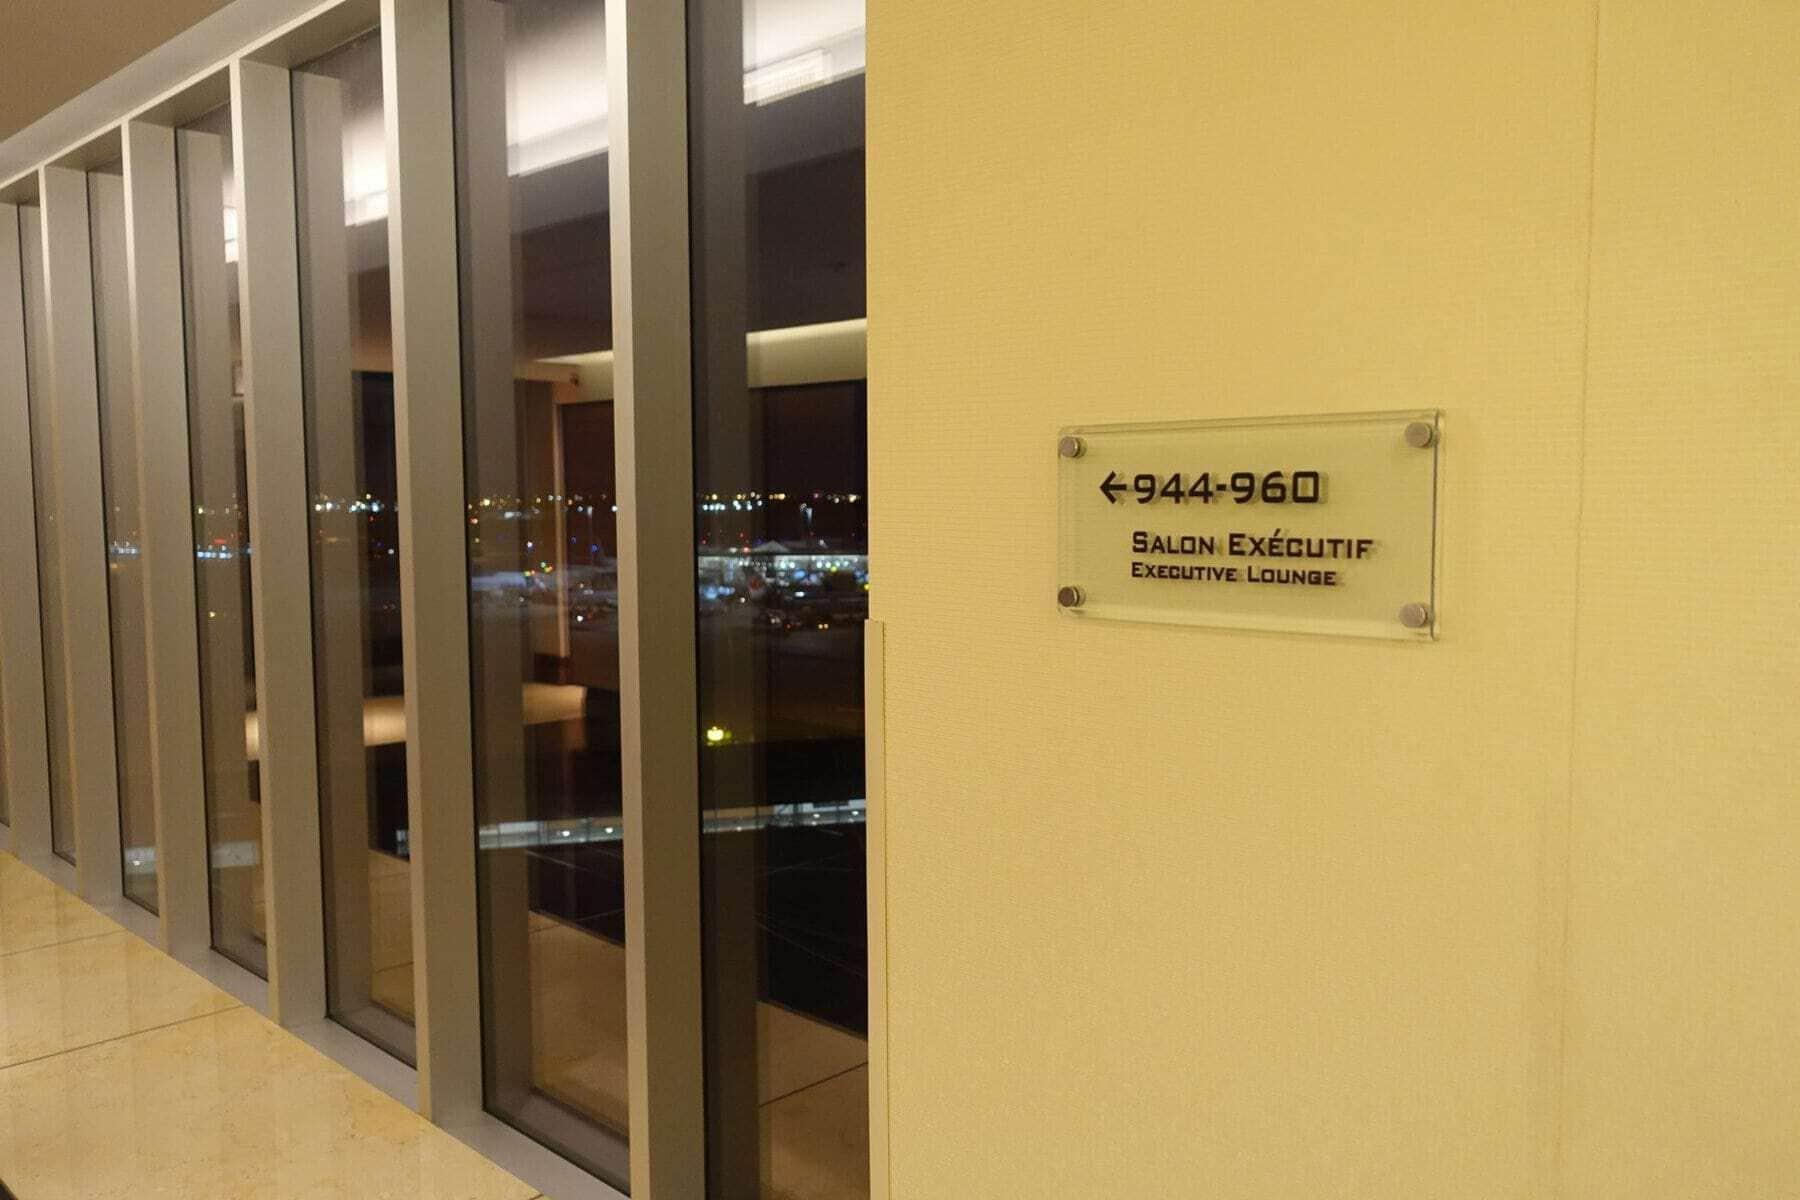 marriott terminal aeroport montreal yul - salon executif